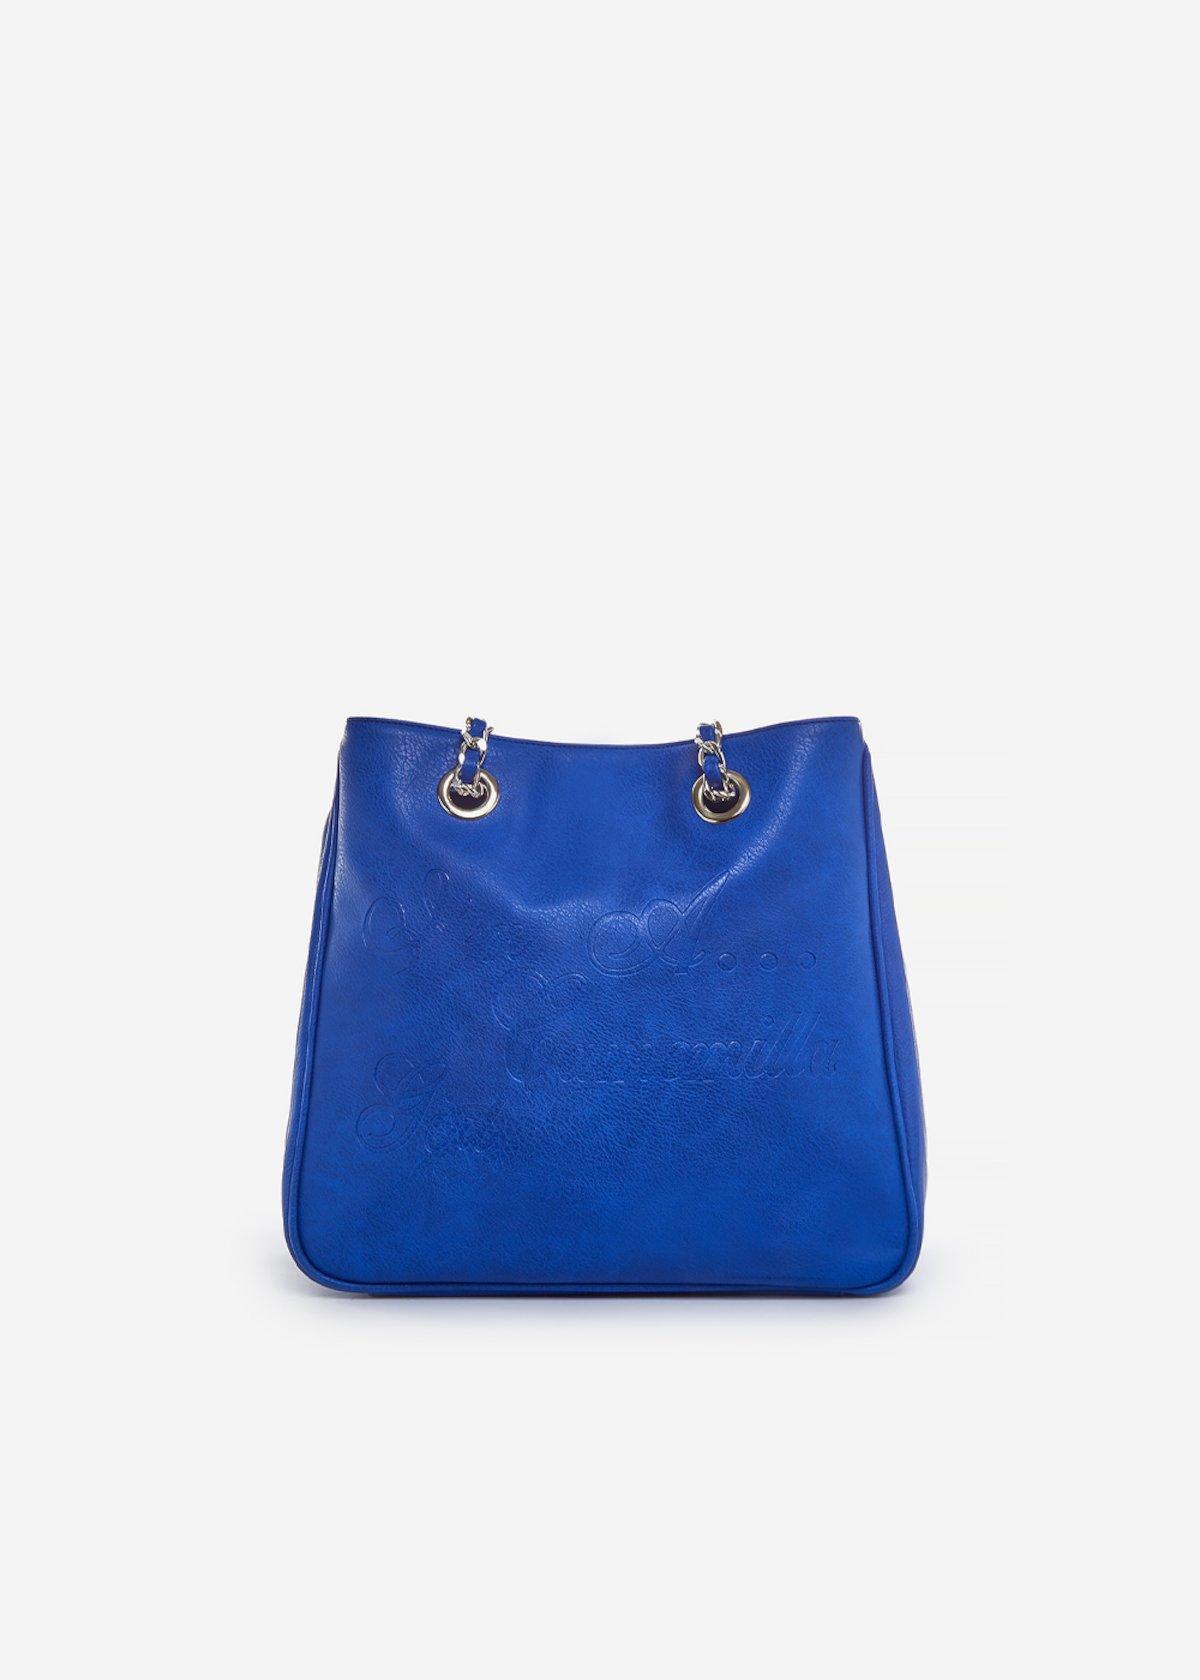 Daily look shopping bag Mini Camo Girl - Formentera